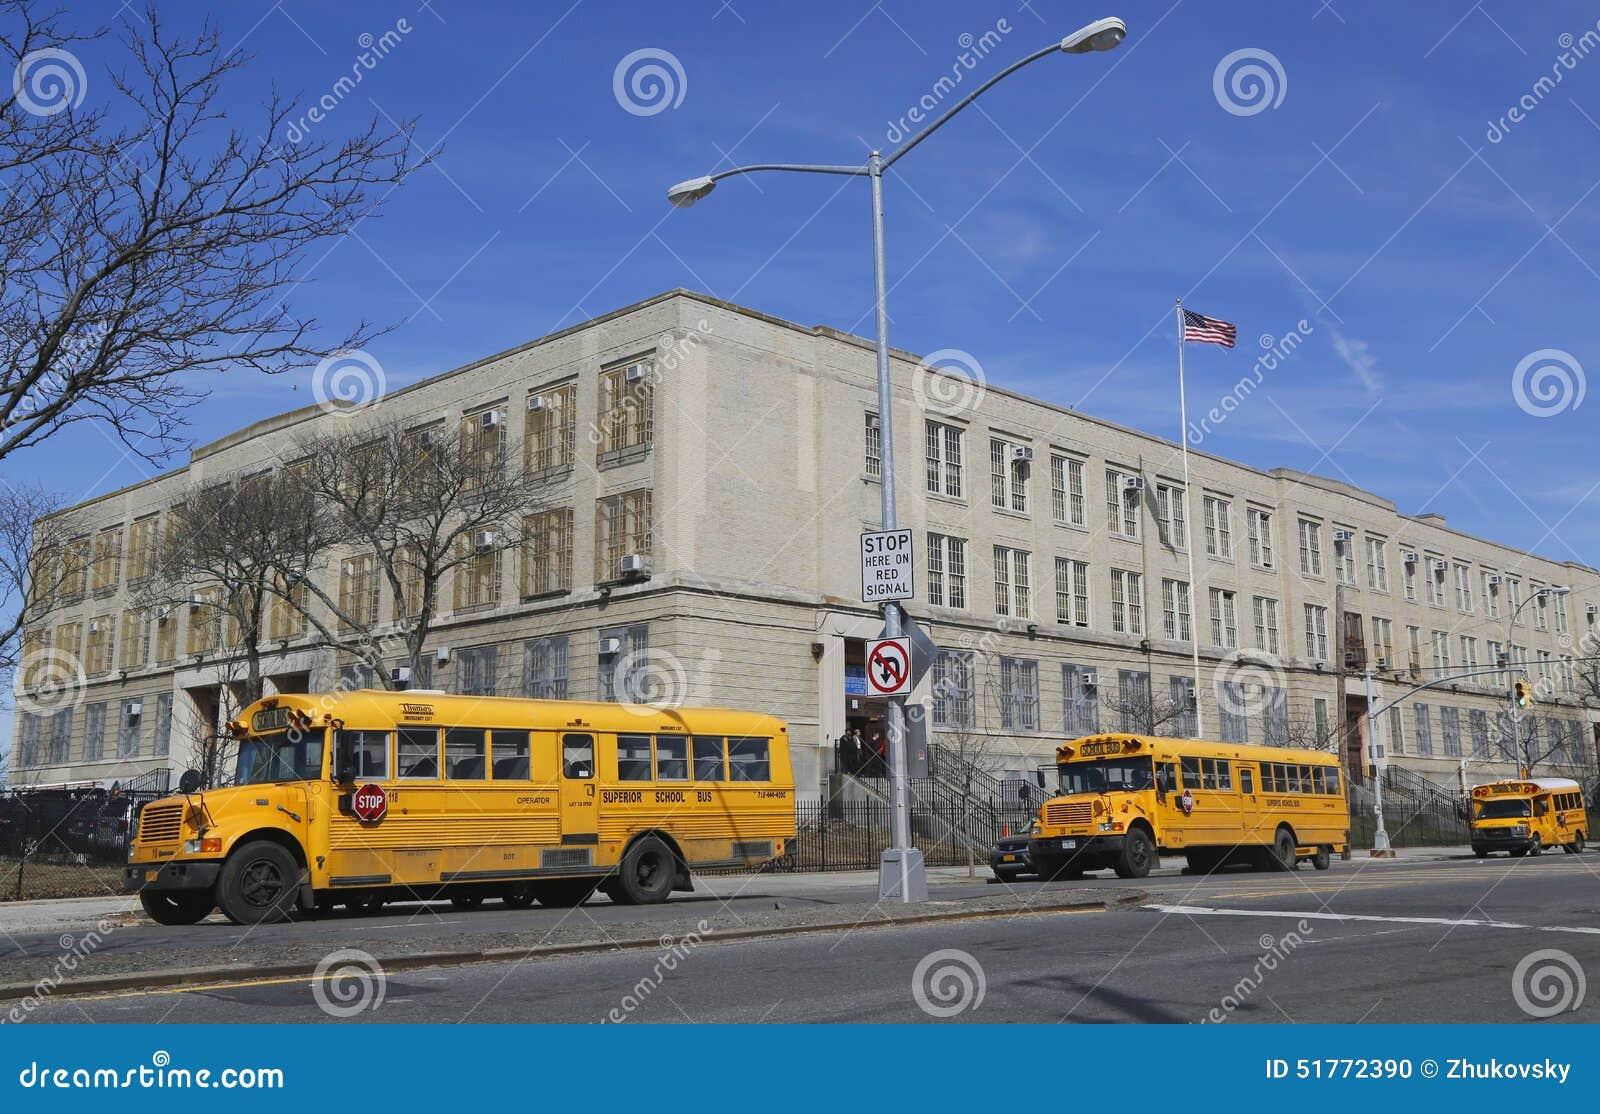 school buses editorial image 67760118. Black Bedroom Furniture Sets. Home Design Ideas